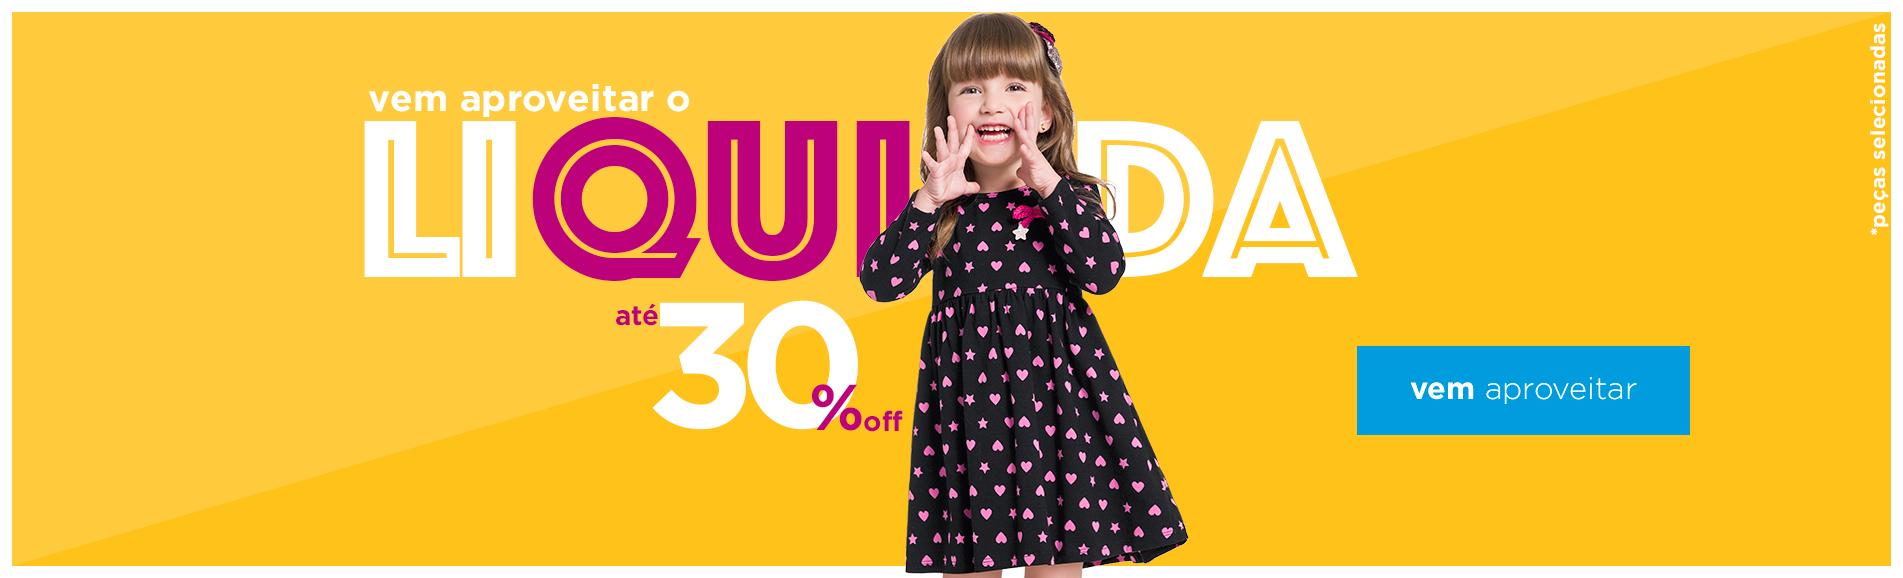 Banner Liquida 01